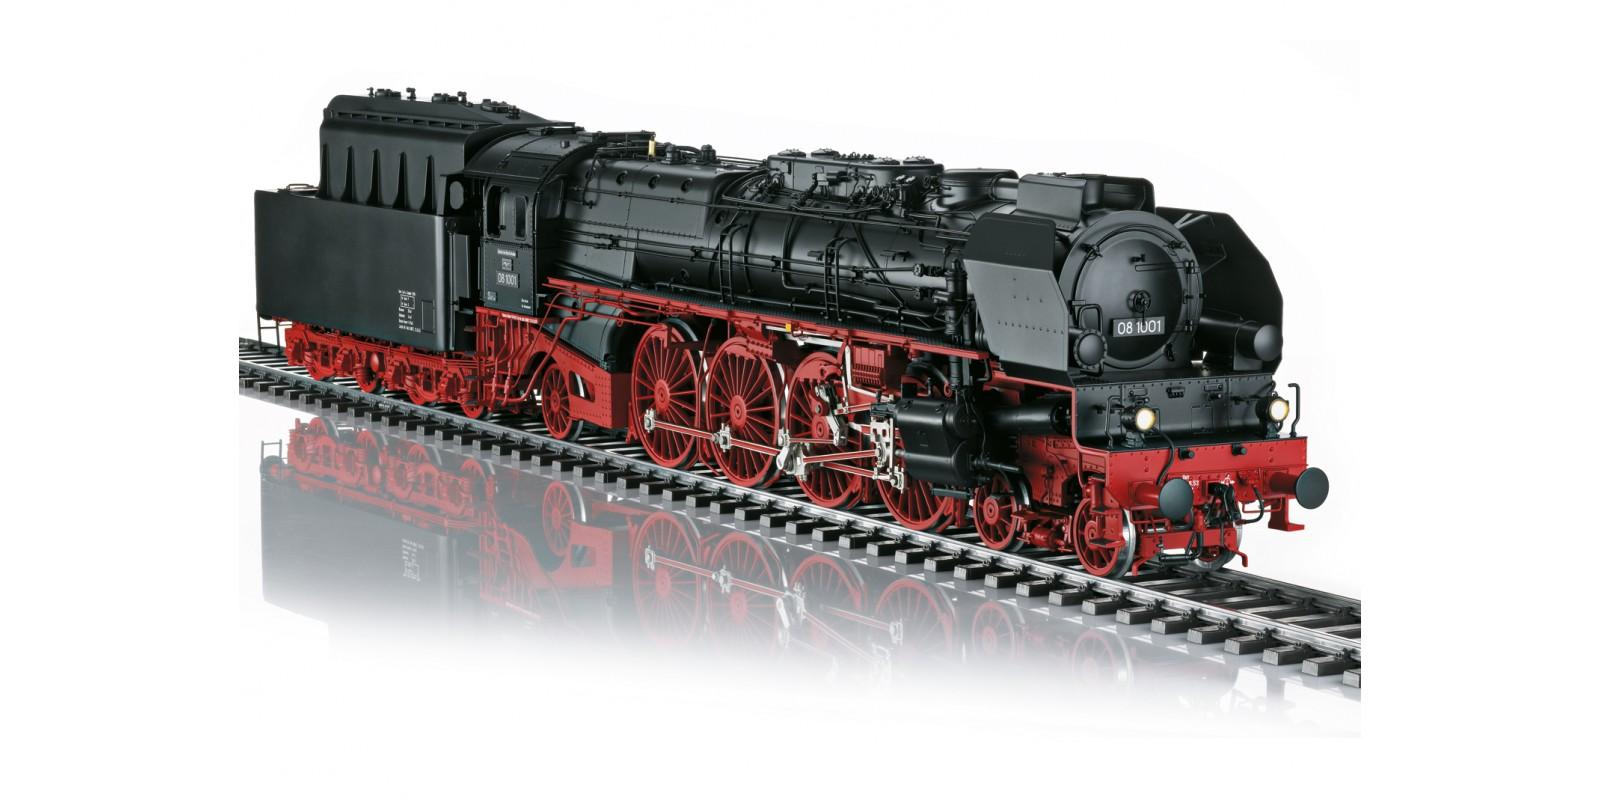 055081 Class 08 Steam Locomotive